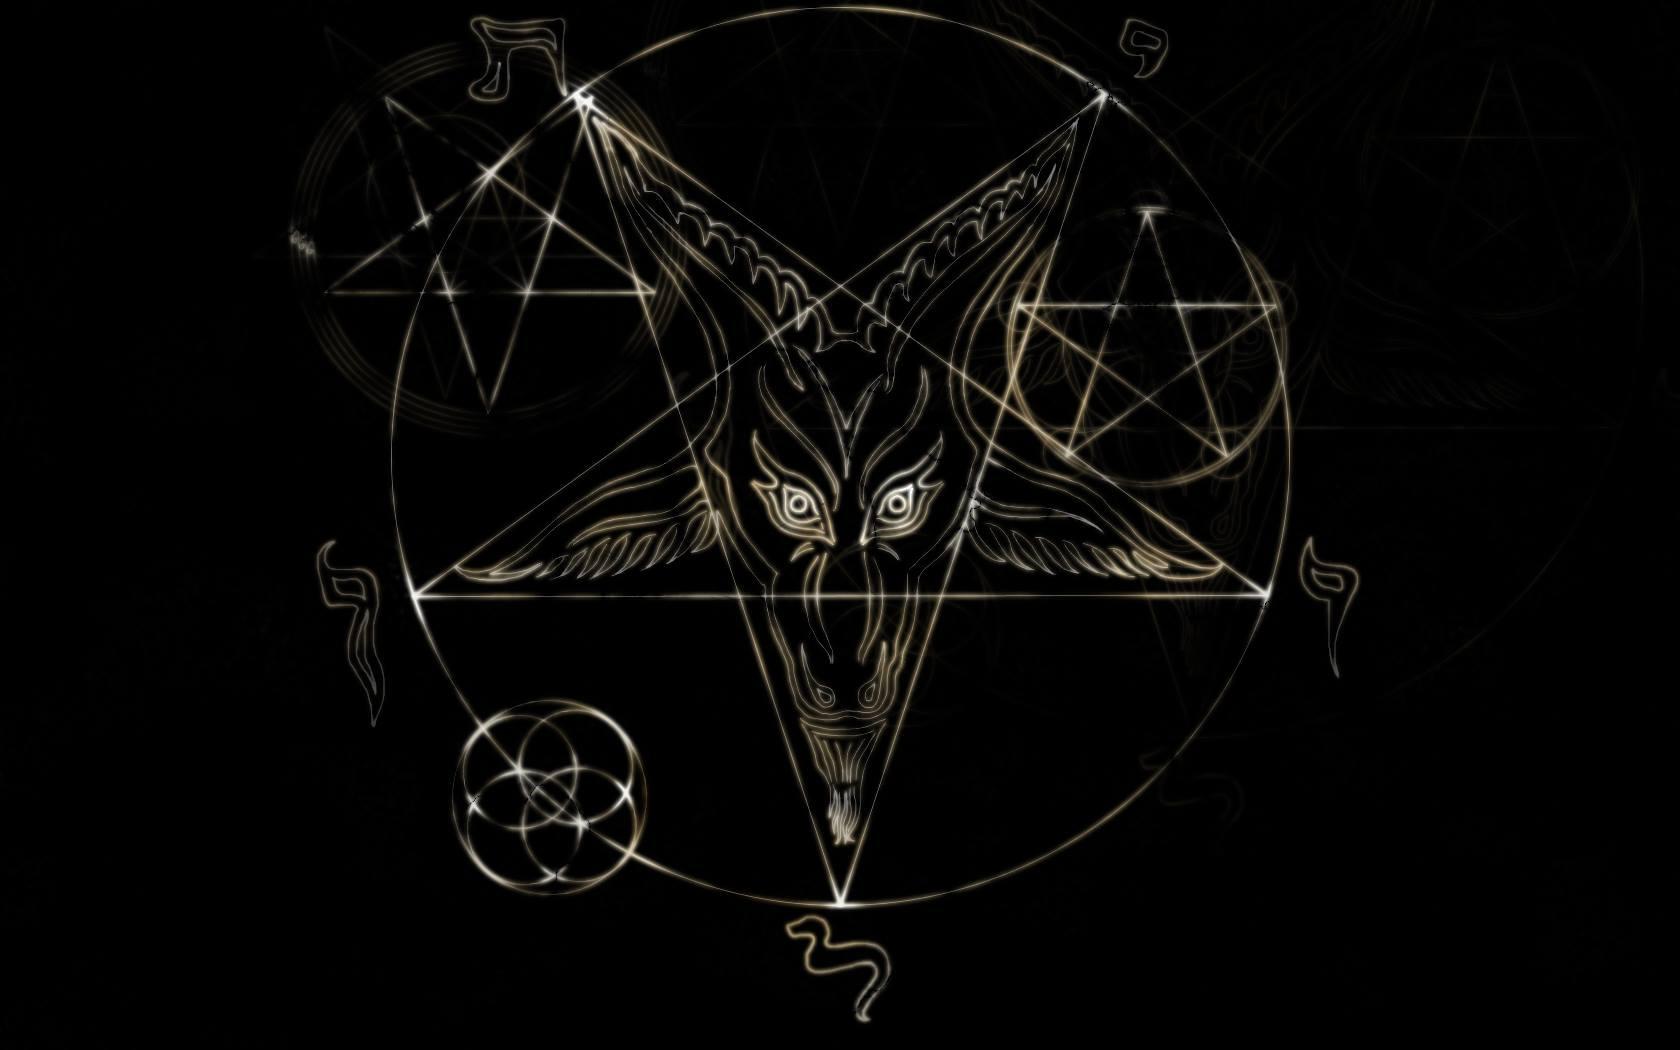 Pentagrama digital